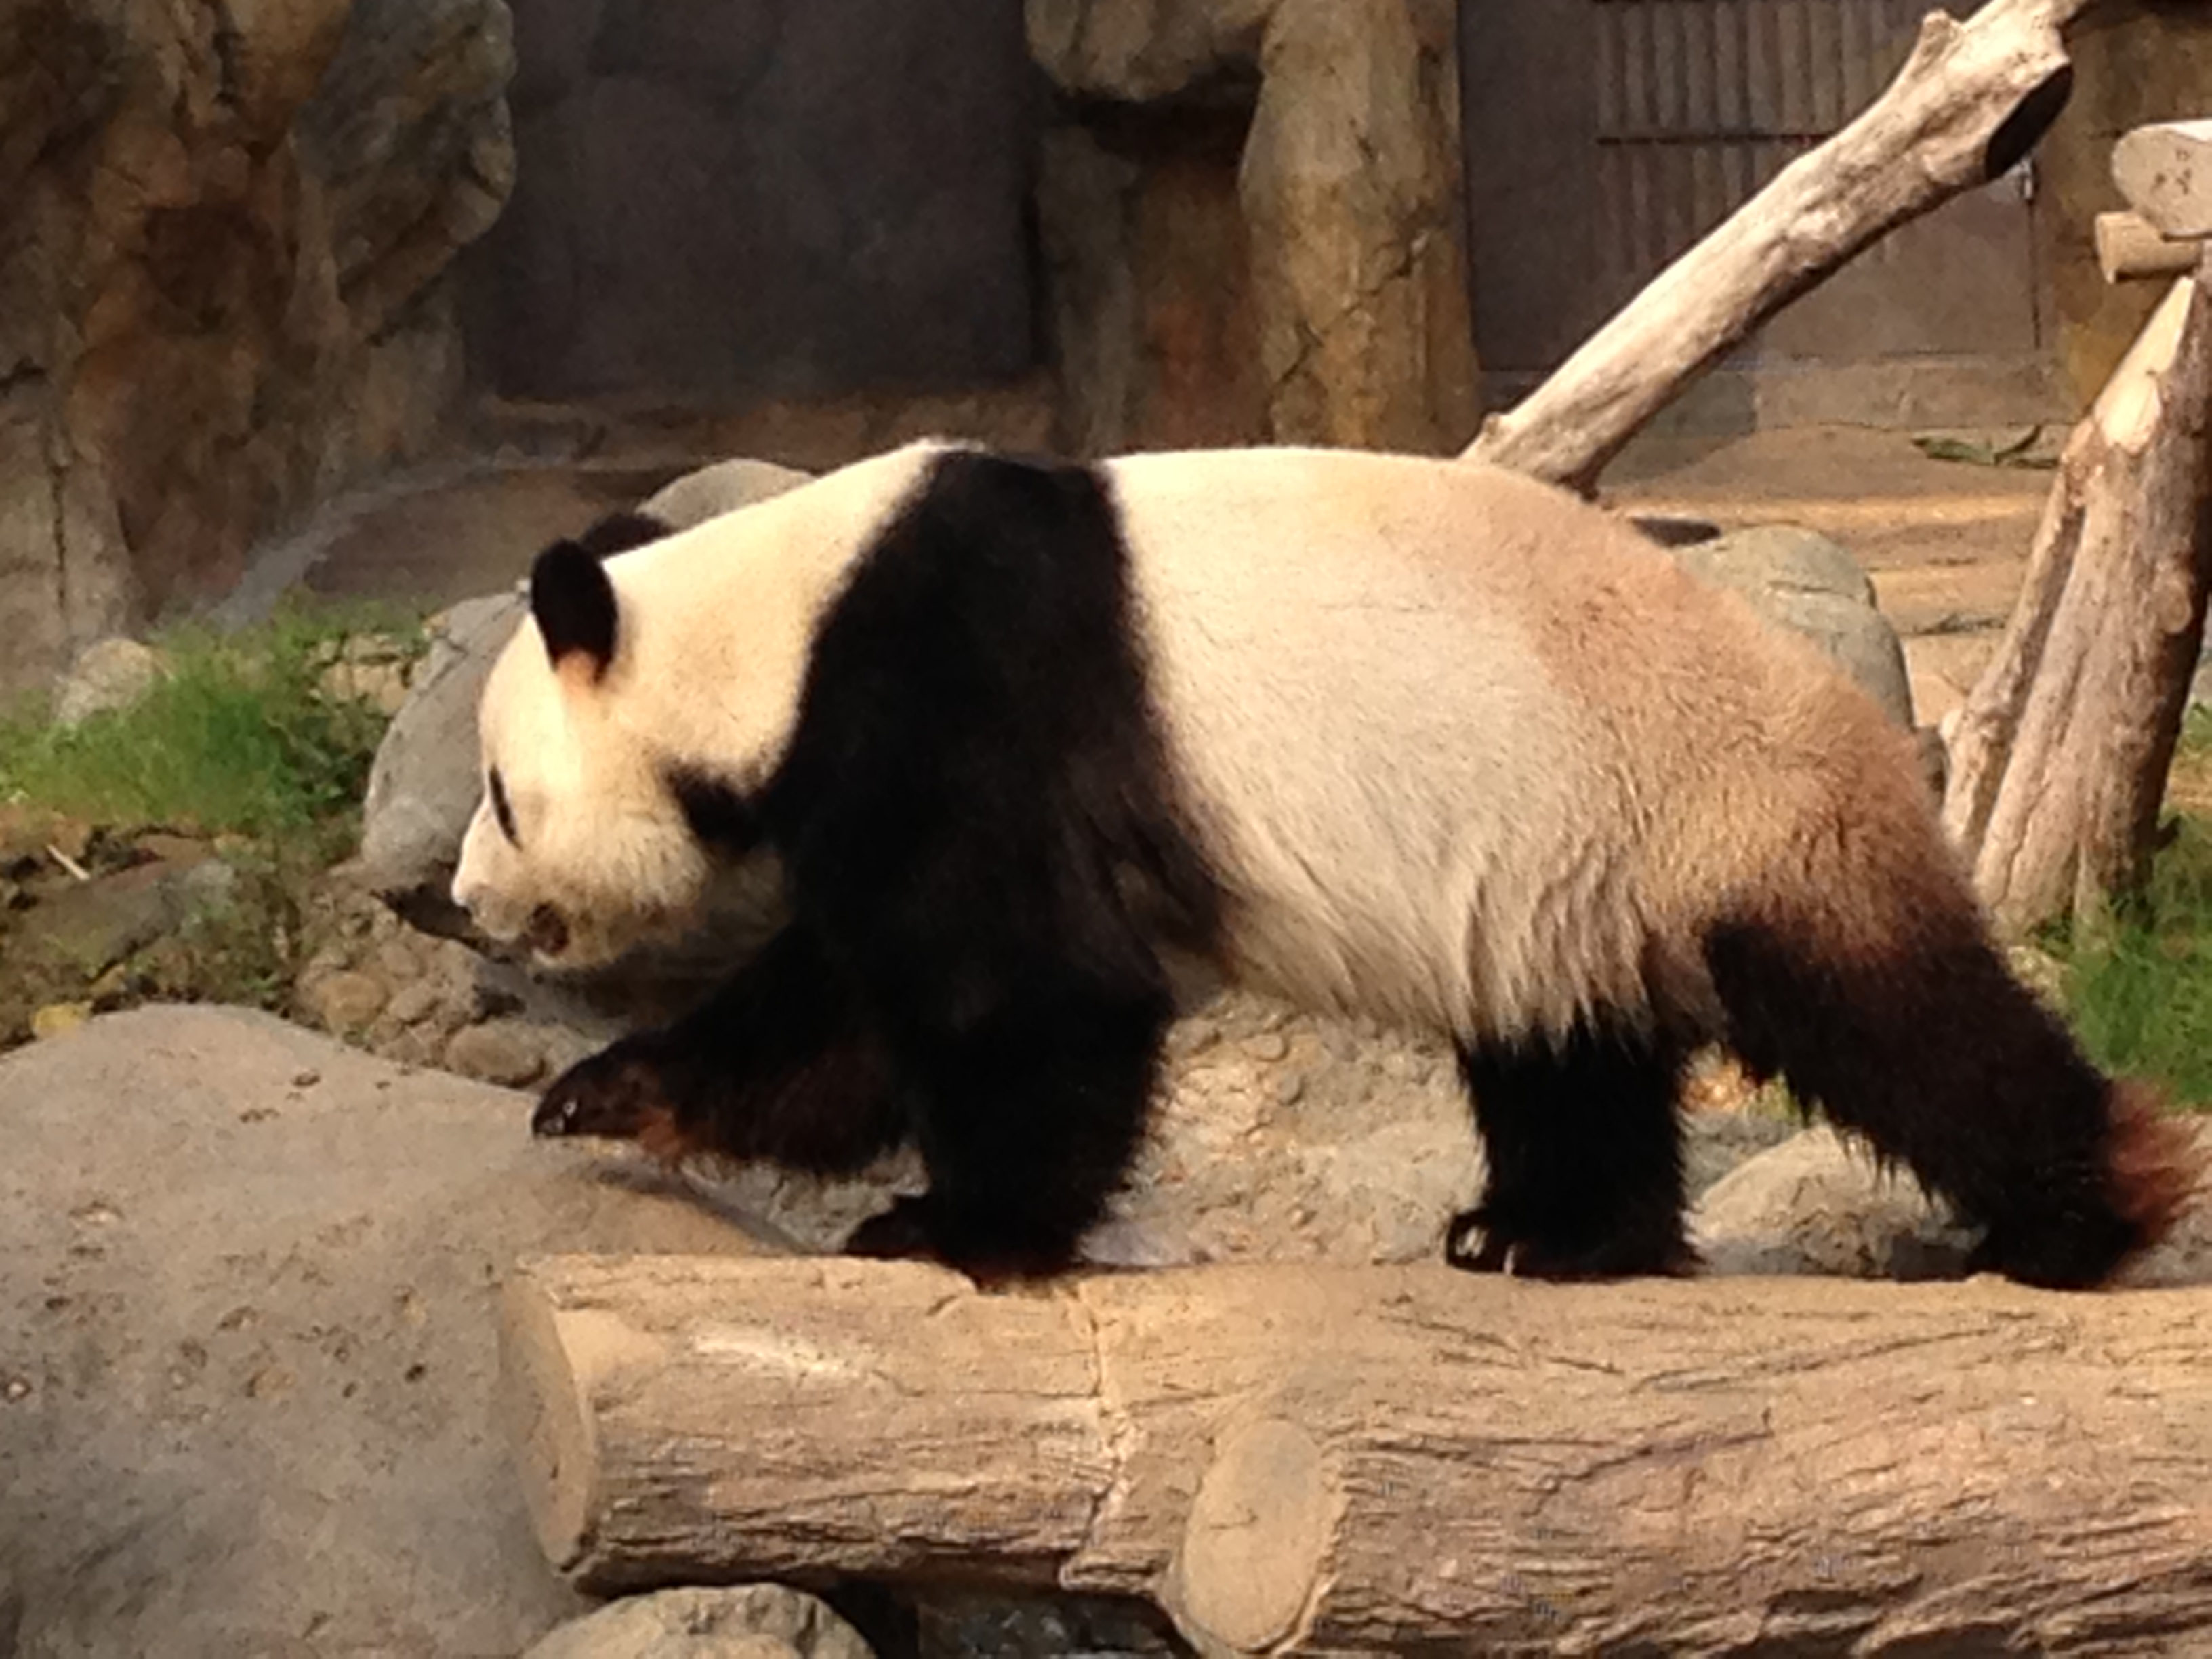 China Giant Panda Facts Habitat Lifespan Food